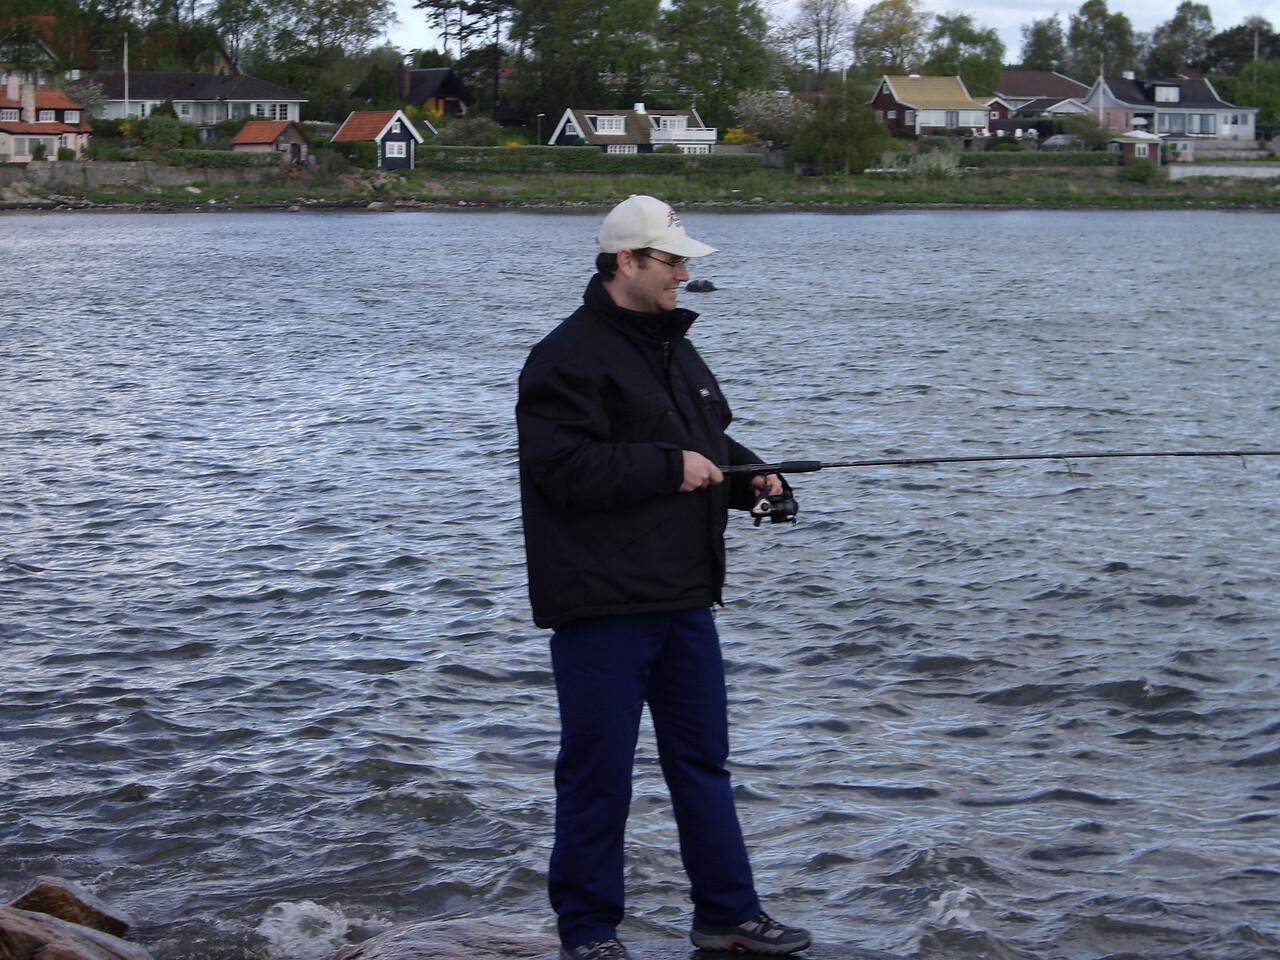 Fiske vid svanshall bla.